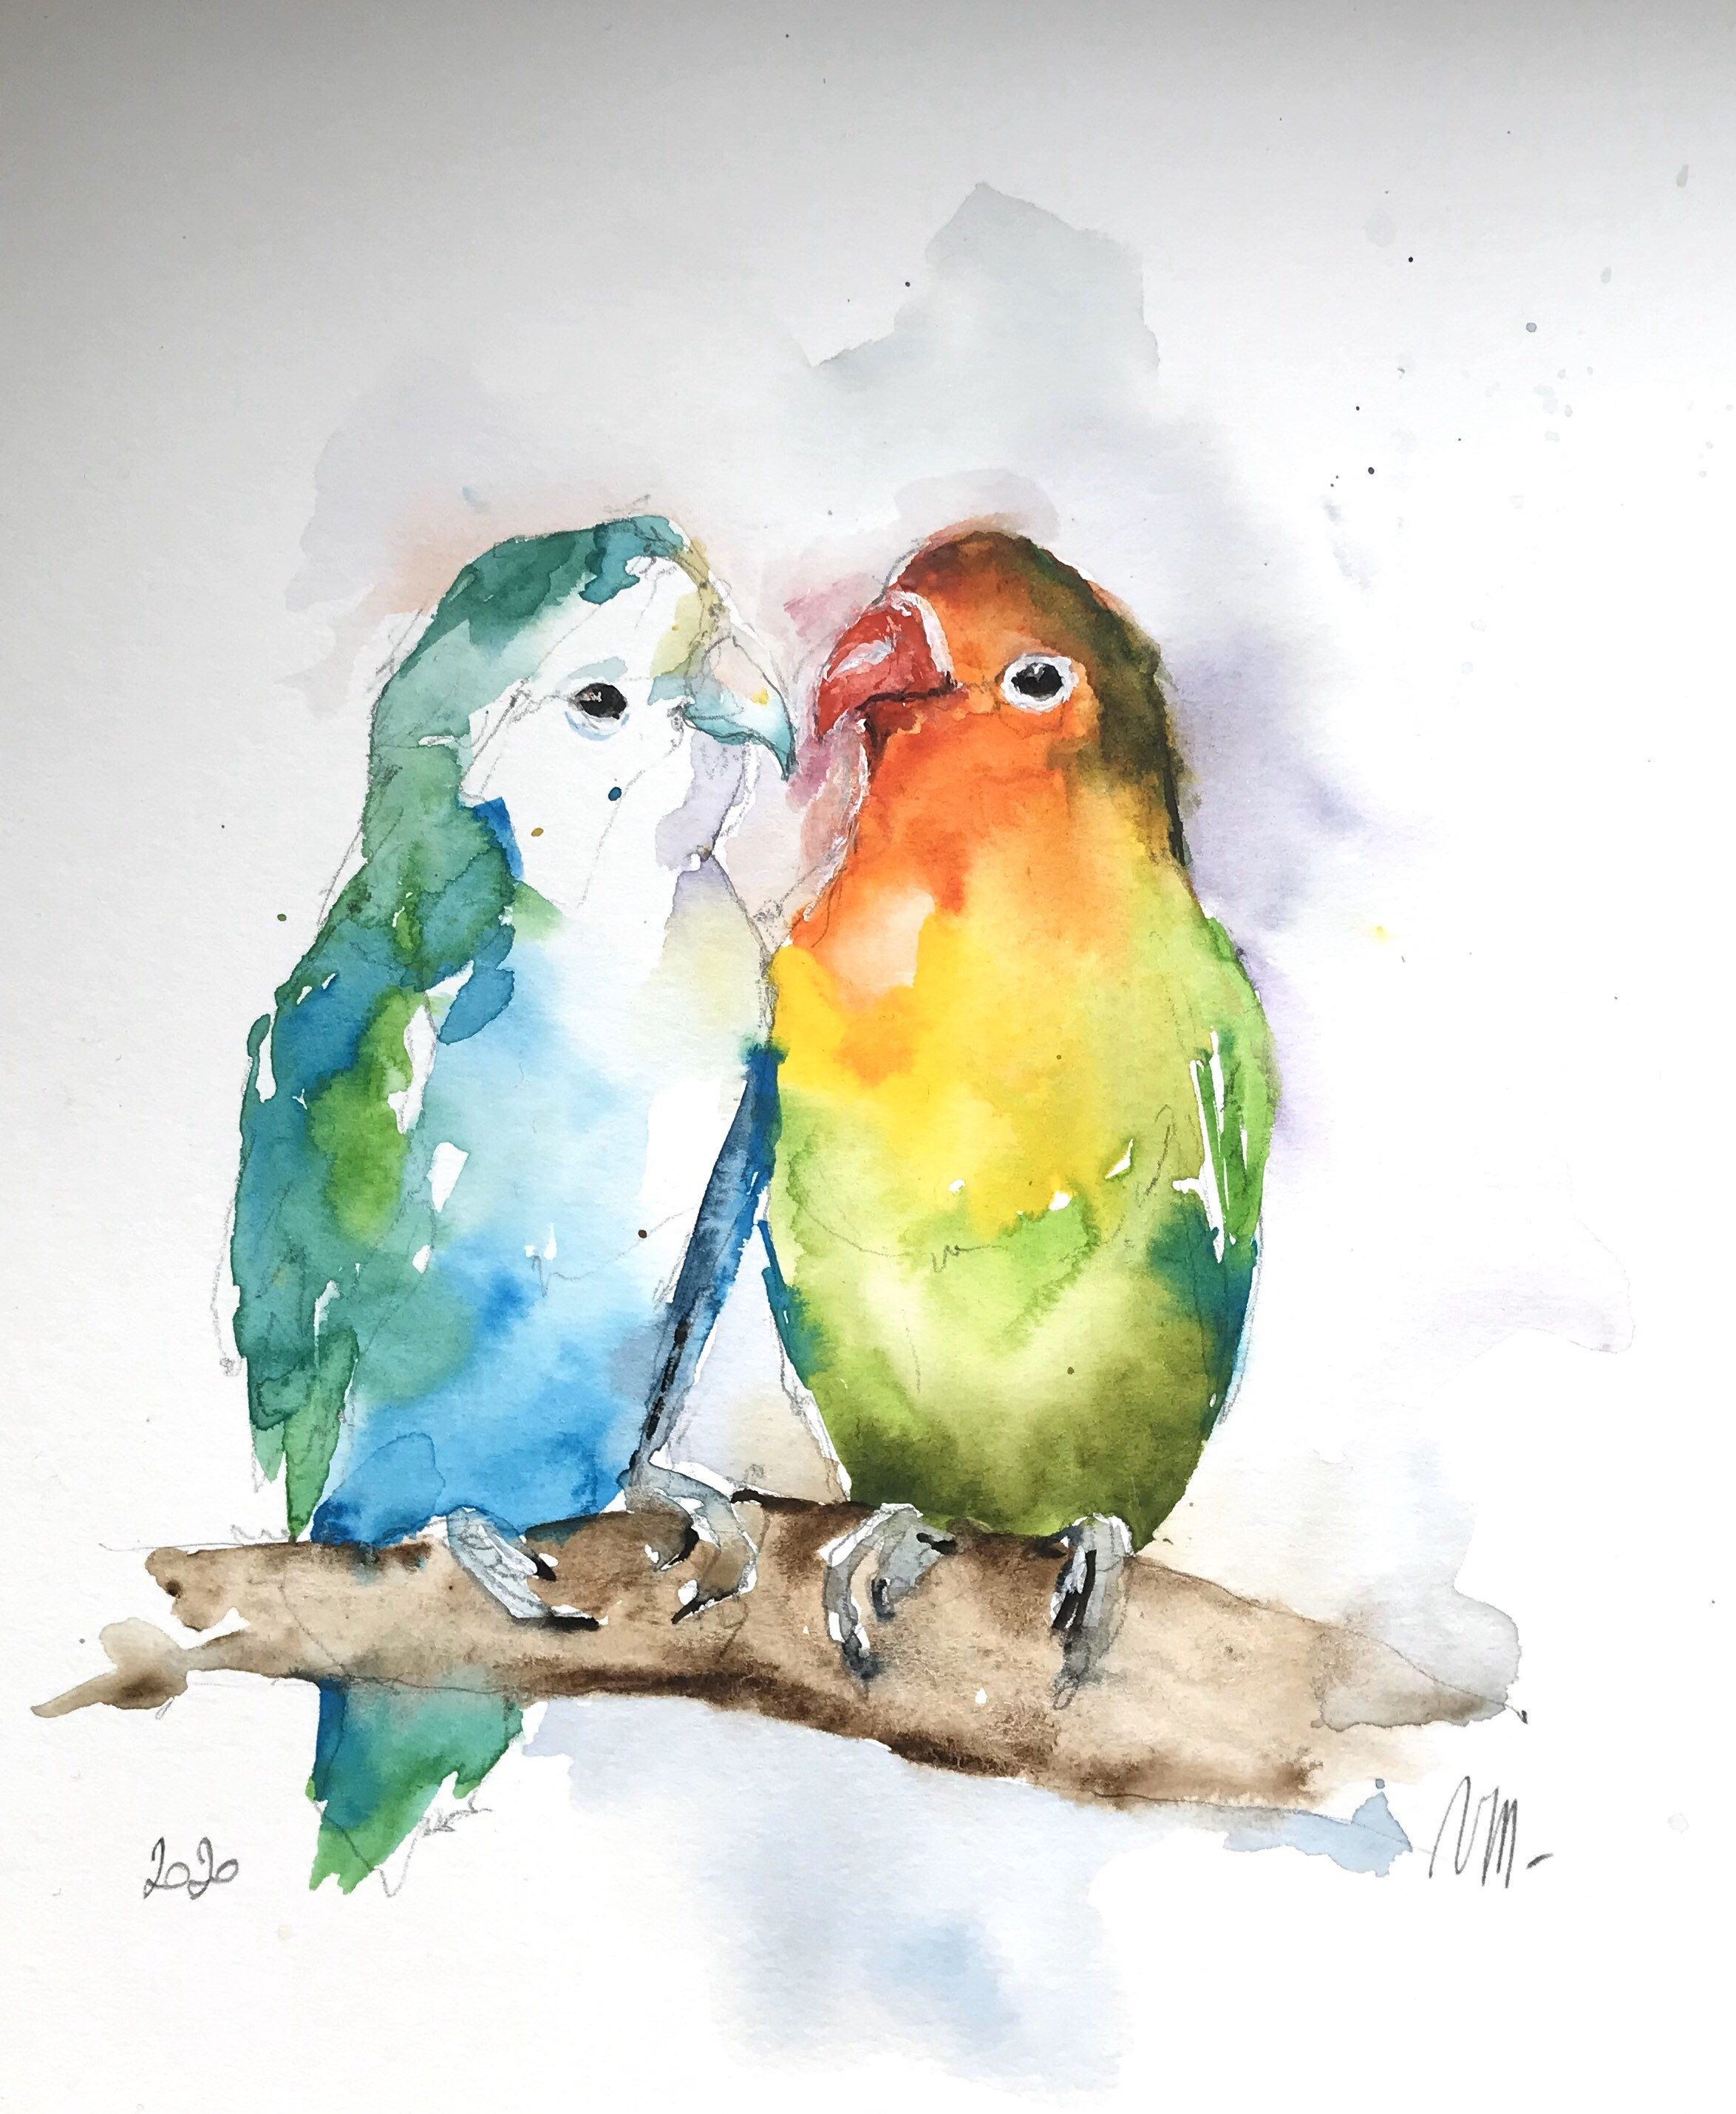 Aquarelle Originale Perruches Oiseaux Exotiques Animal